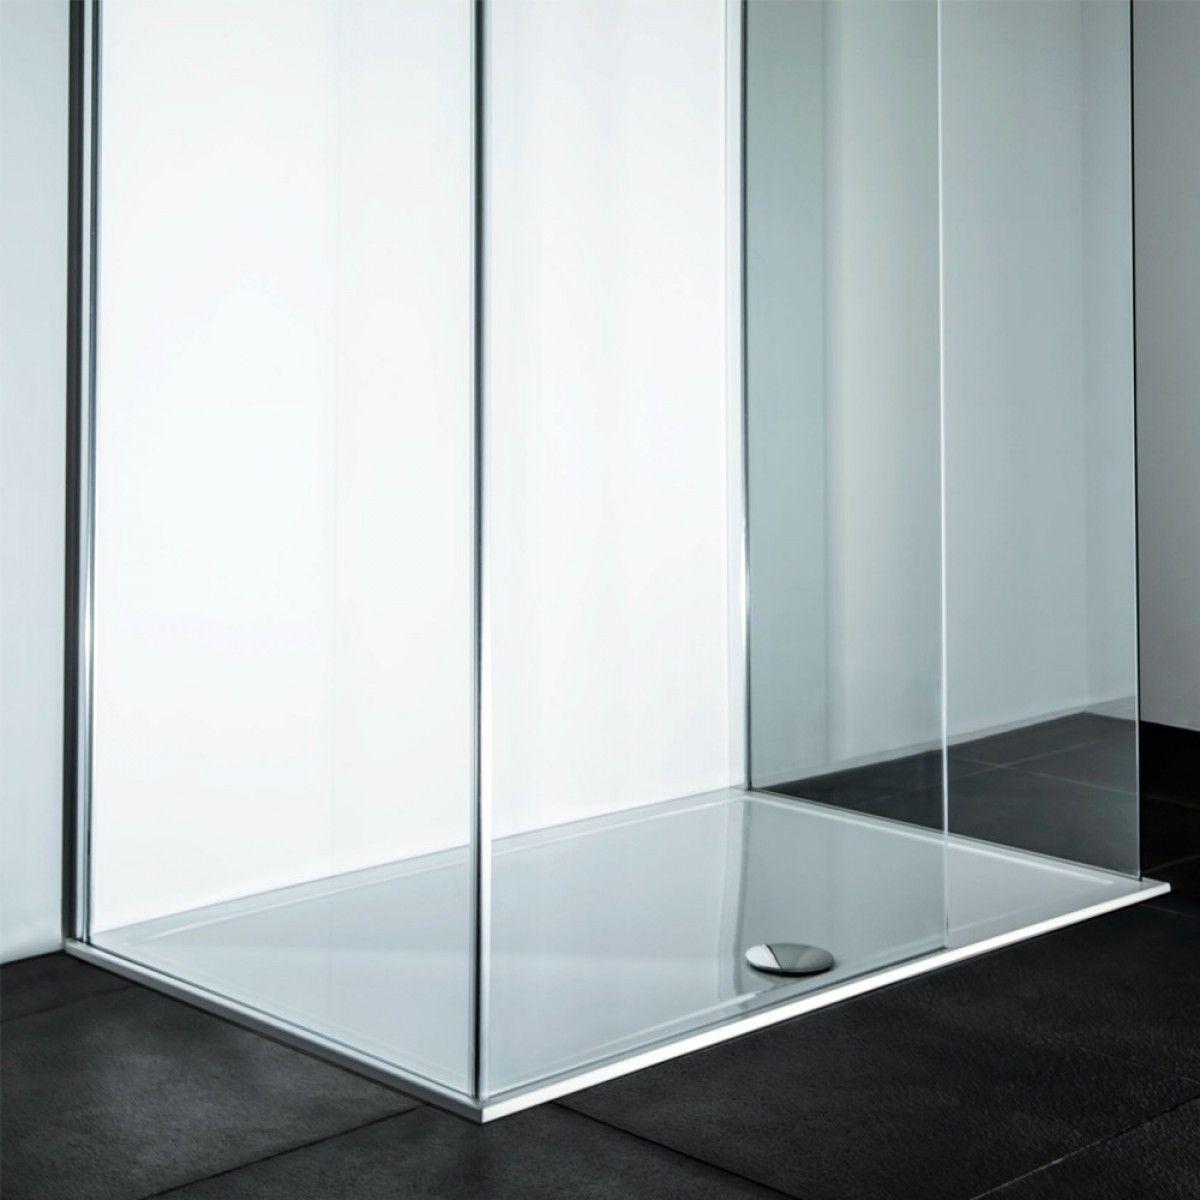 25mm Wafer Thin Luxury Stone Rectangular Shower Tray